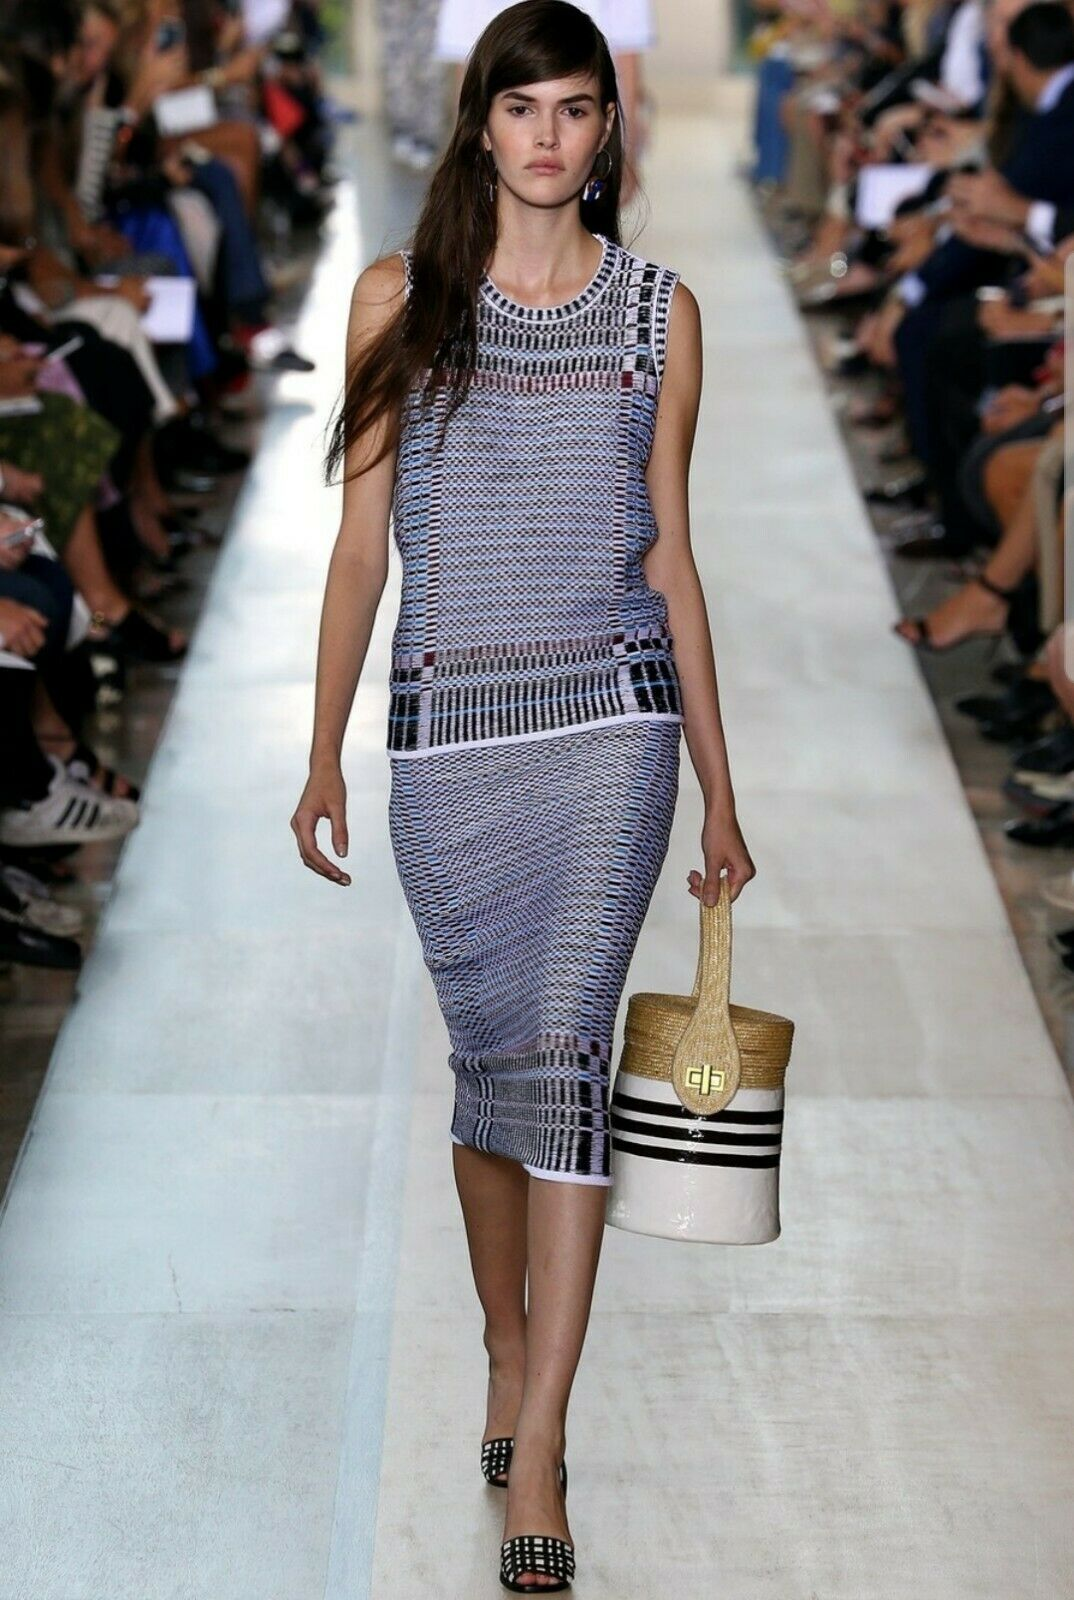 TORY BURCH Blau Jacquard Basket Weave Skirt Größe XS,  A Runway Collection,  350